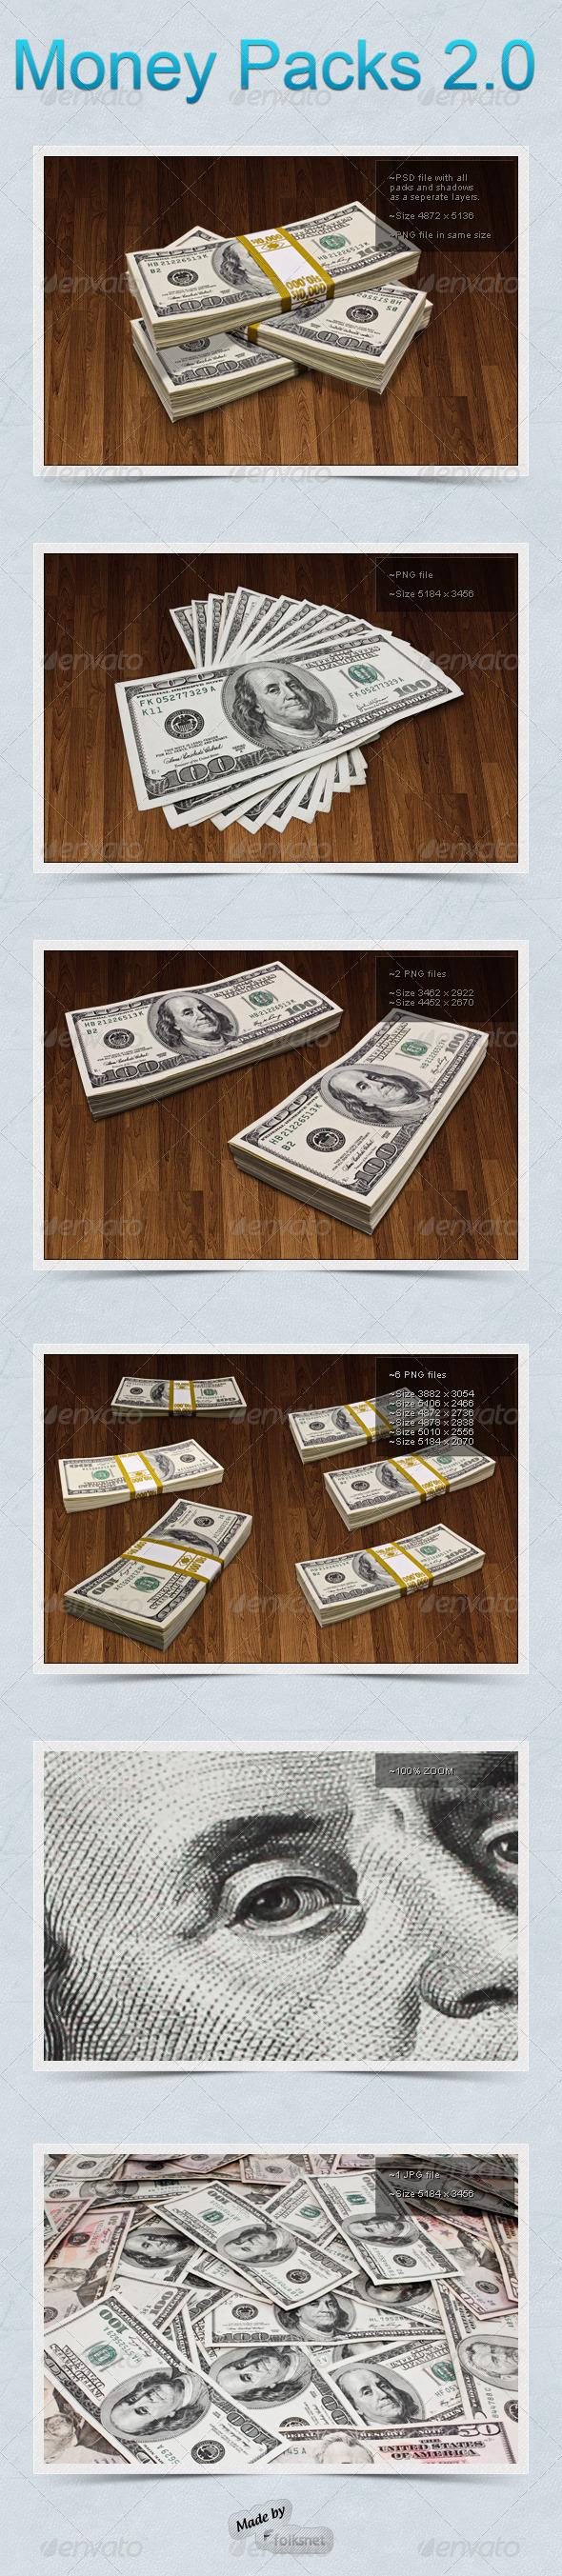 GraphicRiver Money Packs 2.0 1258280